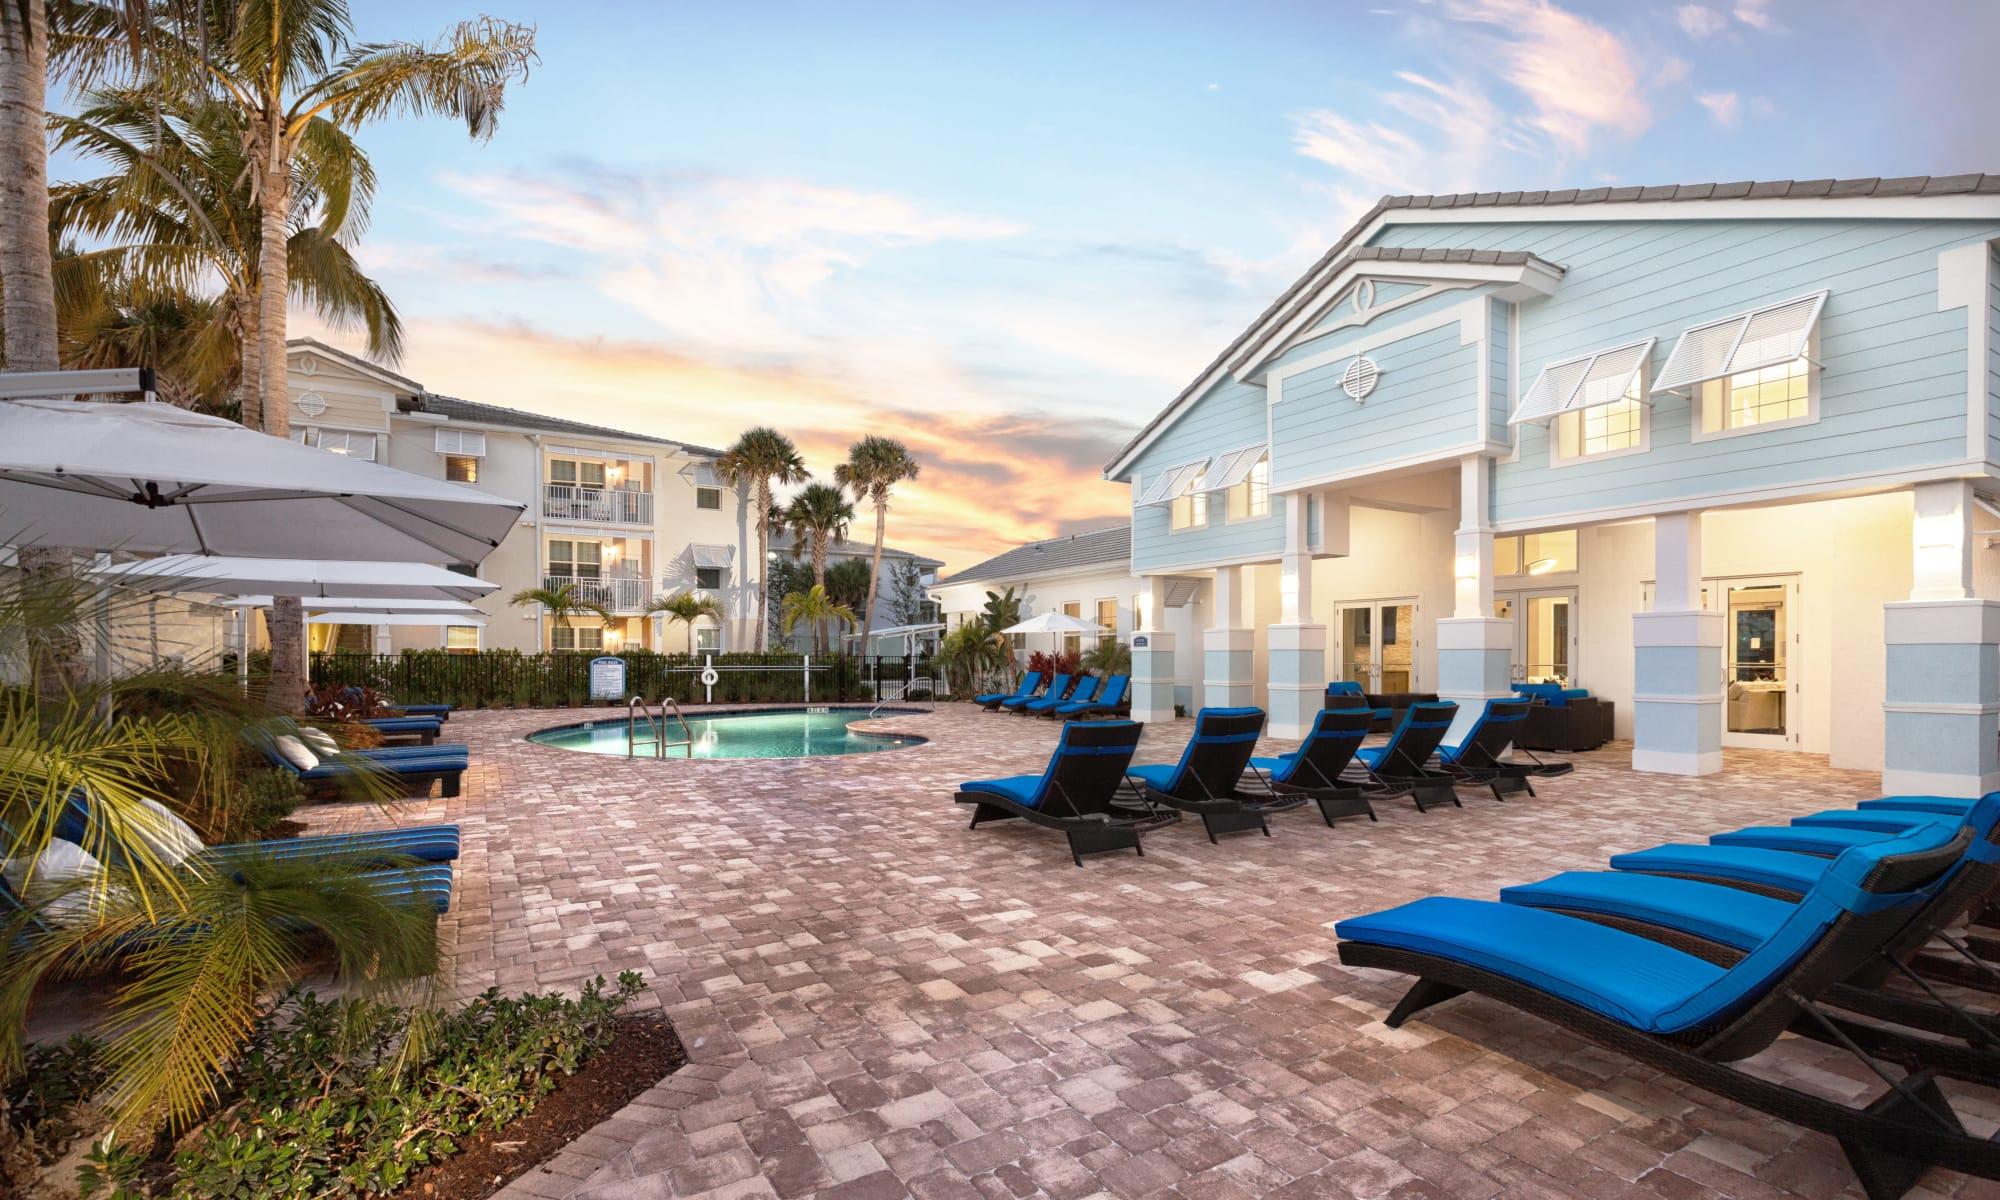 Swimming Pool at High Ridge Landing in Boynton Beach, FL